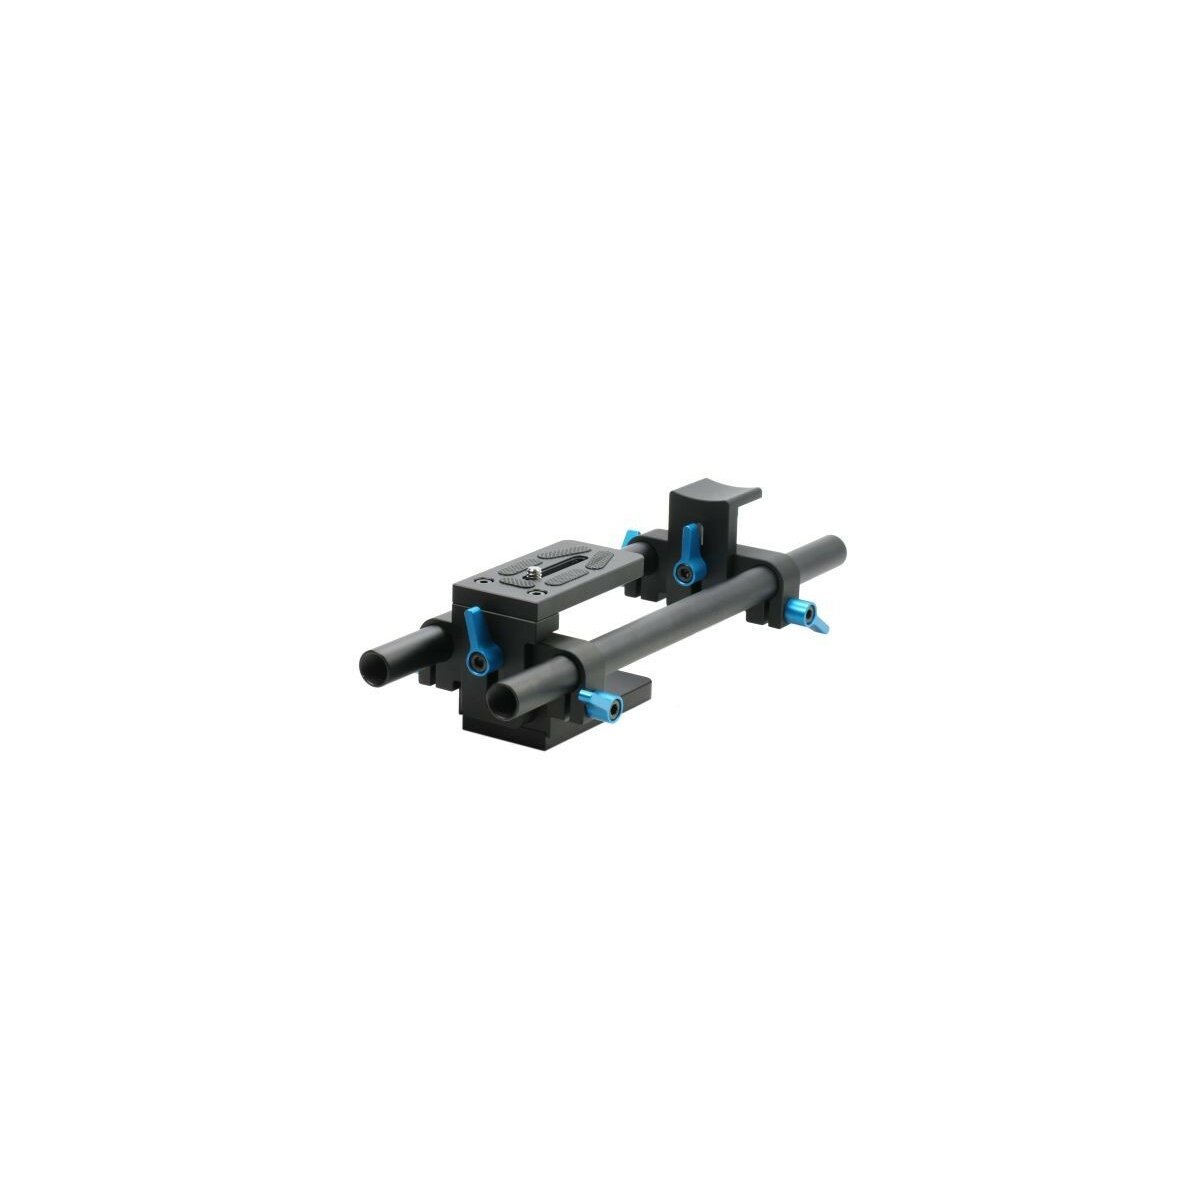 Minadax DP-500 DSLR Rig Stativ Kit fuer DSLR Kameras mit schweren Objektiven